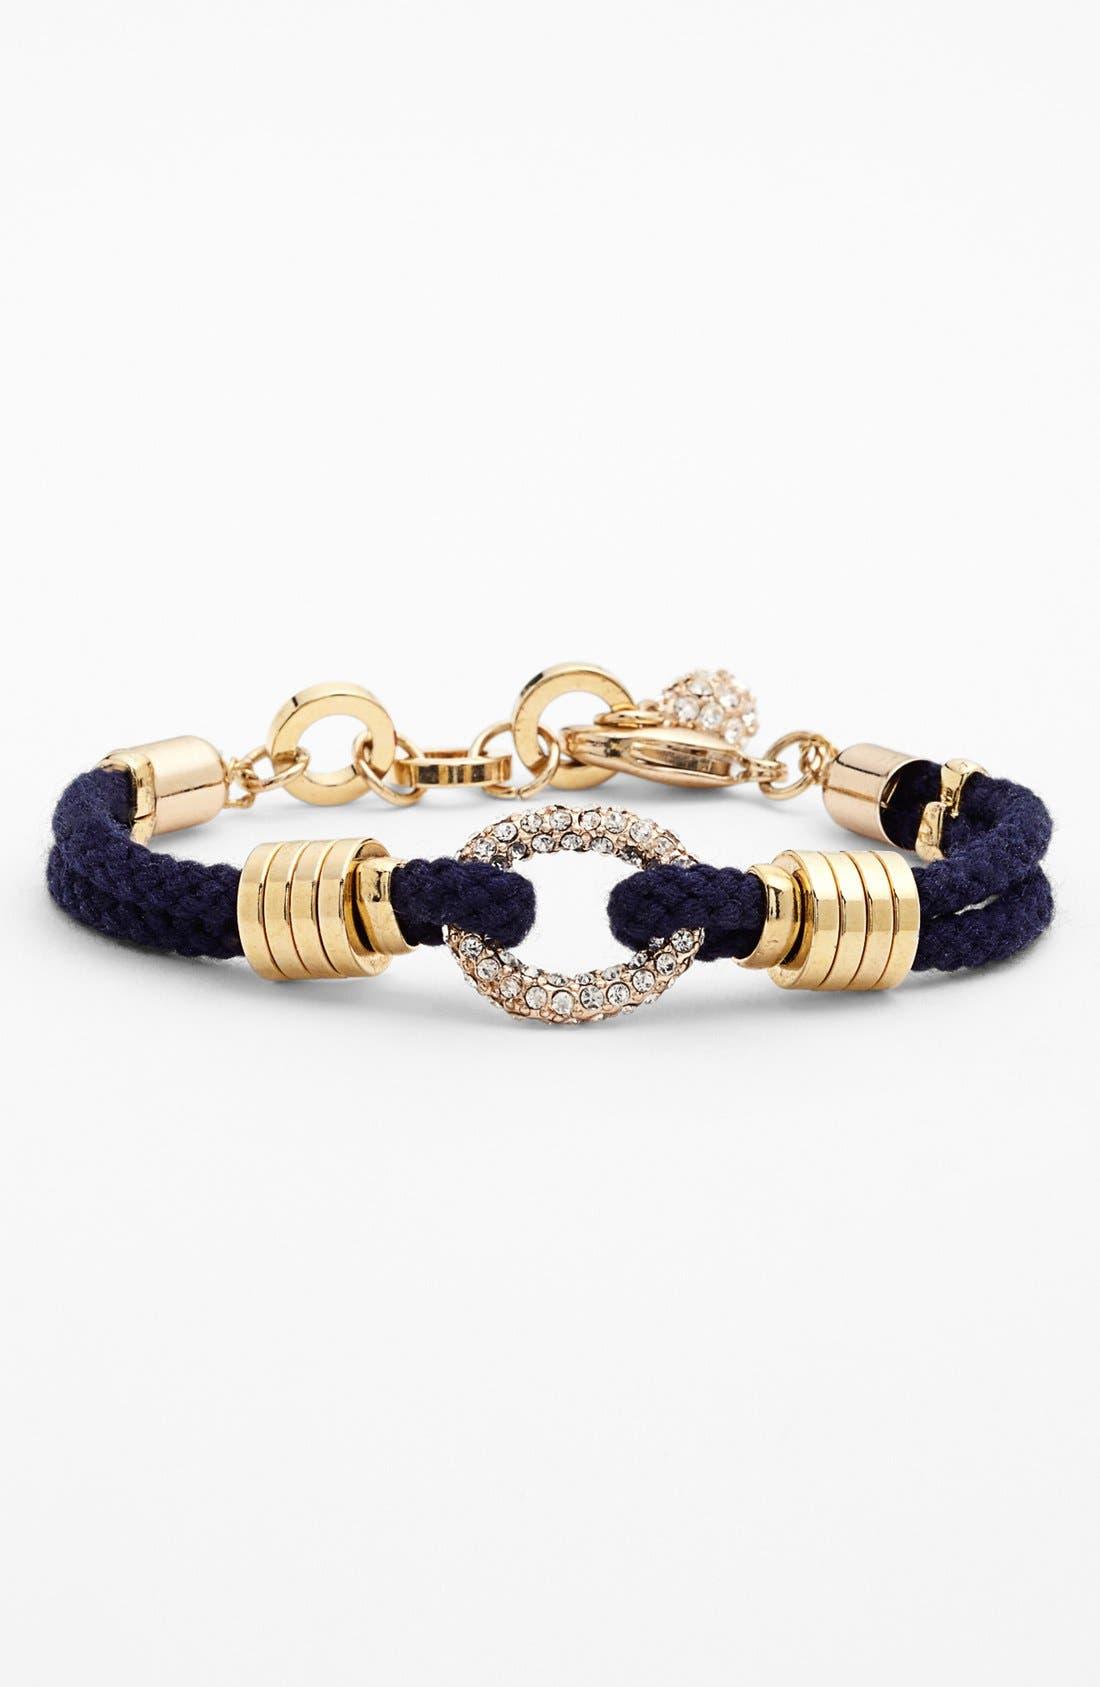 Main Image - Sequin Rope Bracelet